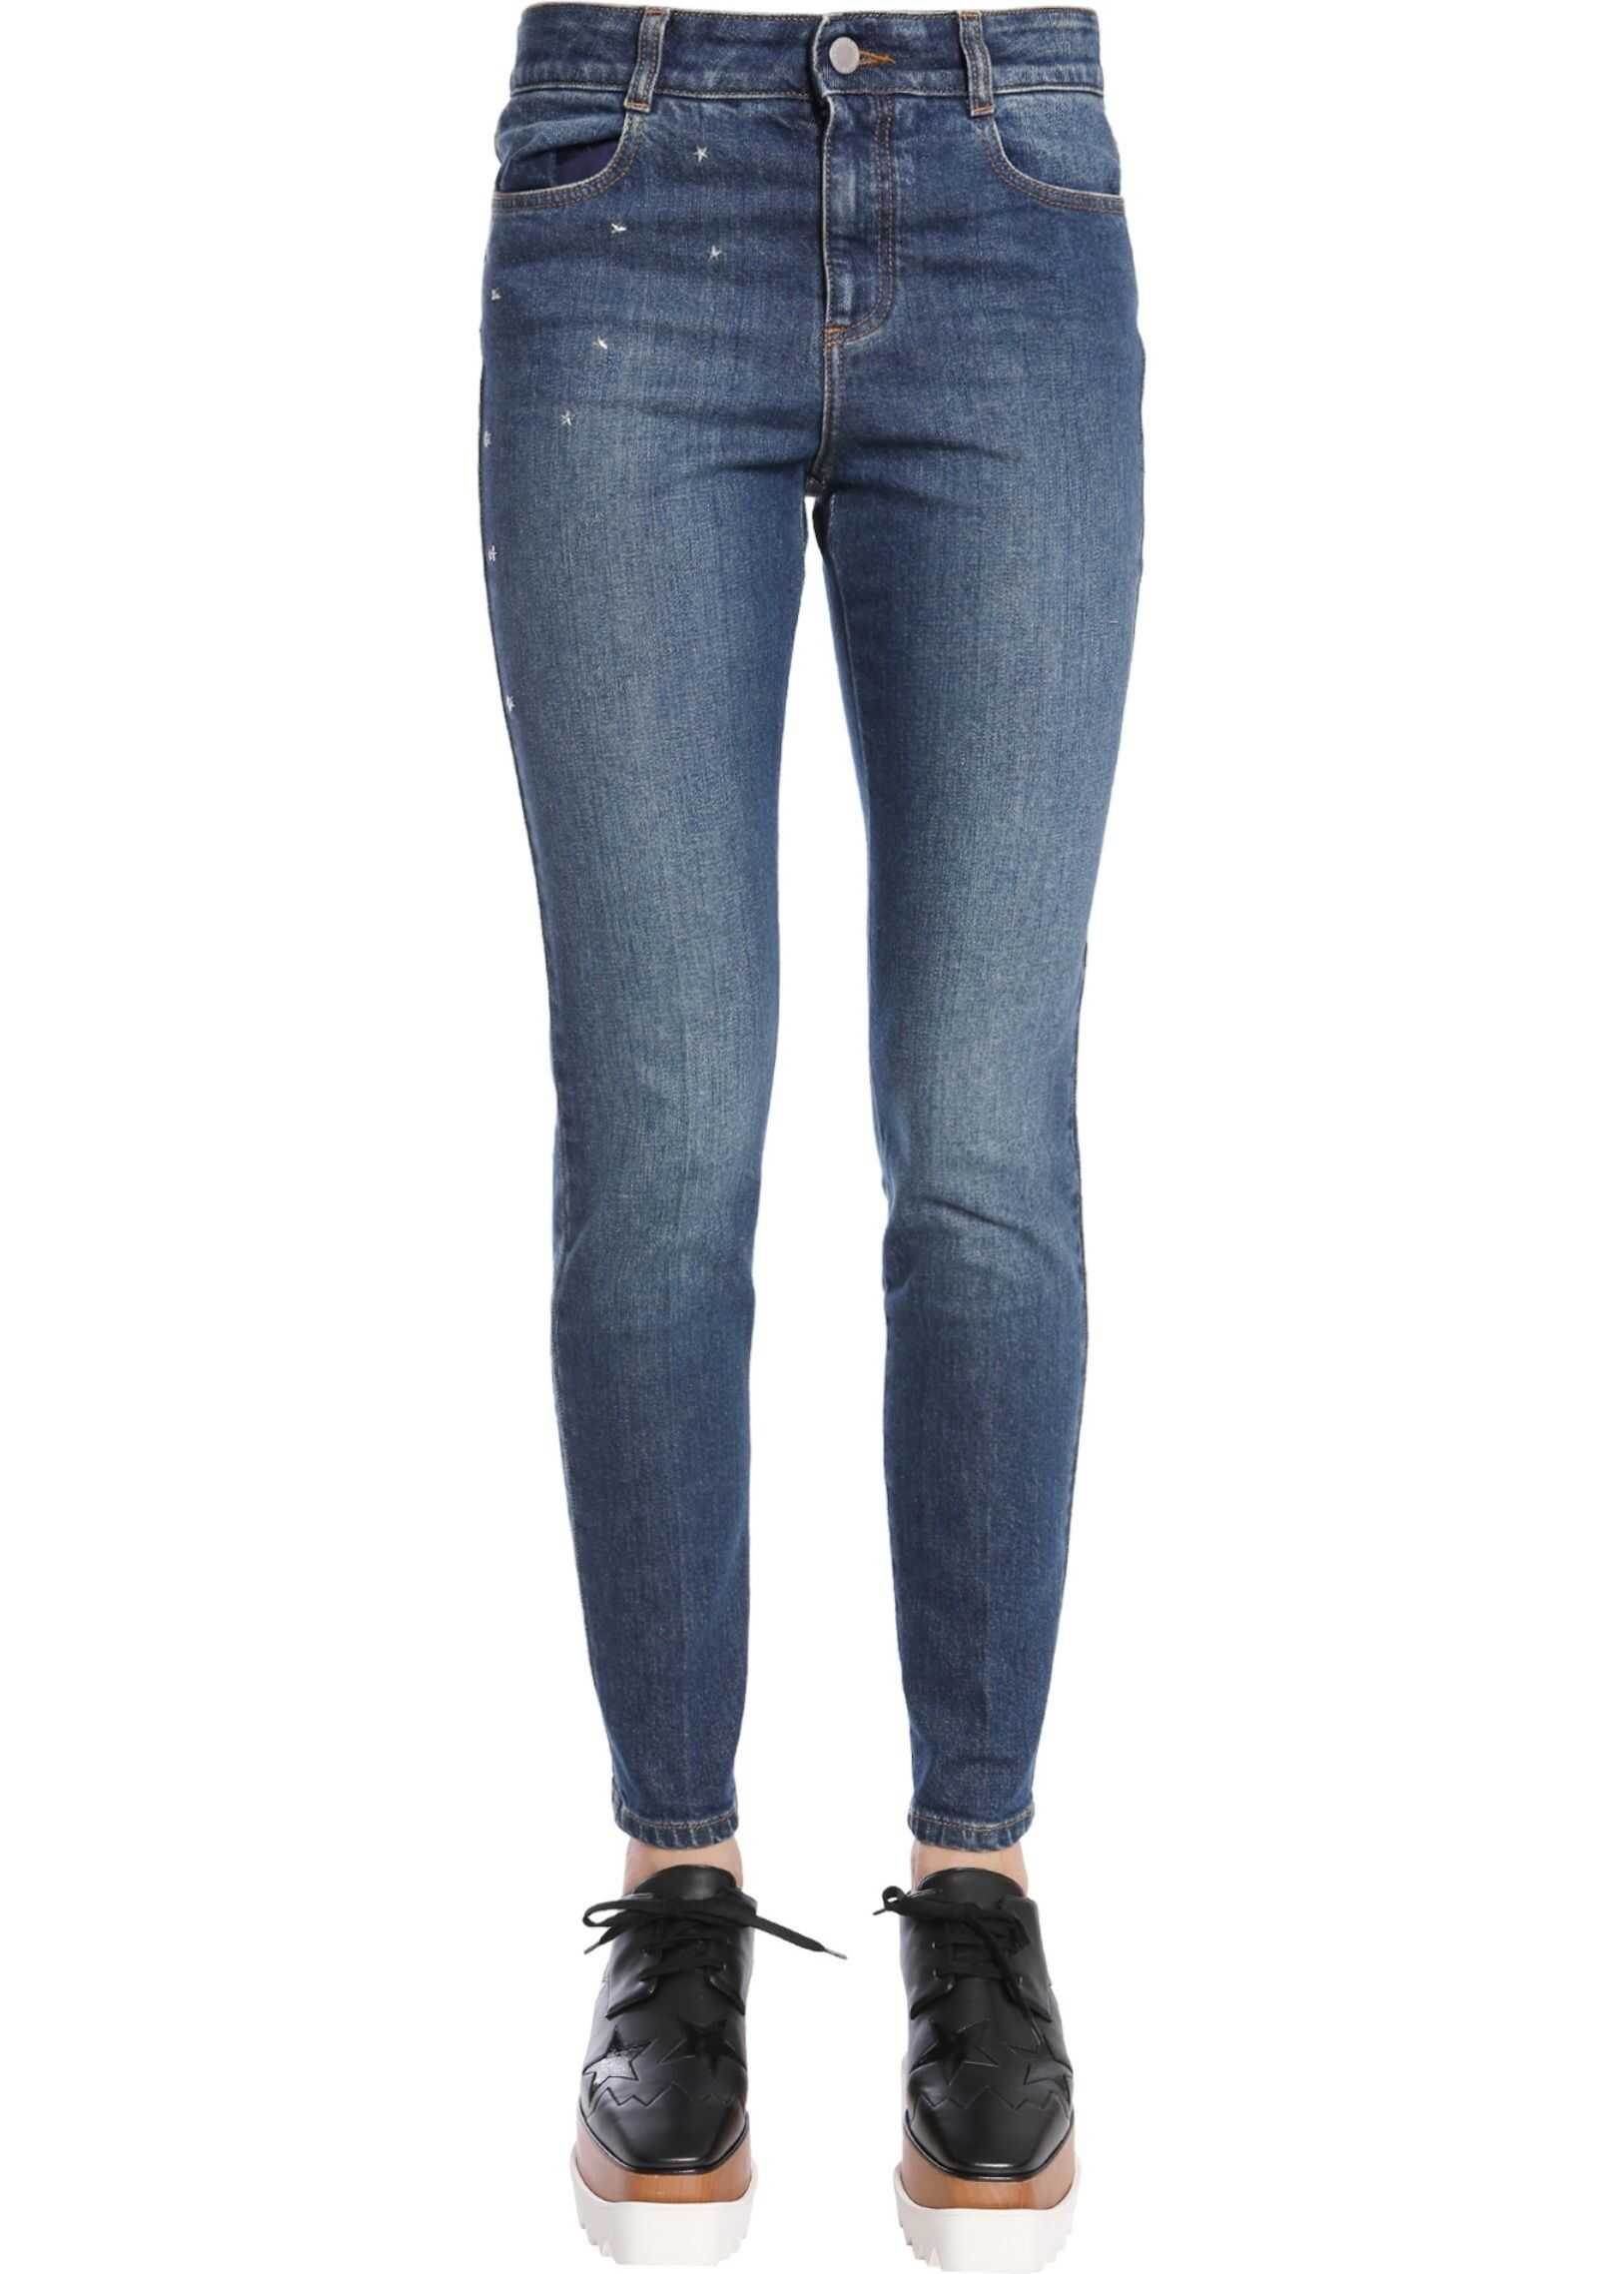 adidas by Stella McCartney High Waist Jeans BLUE